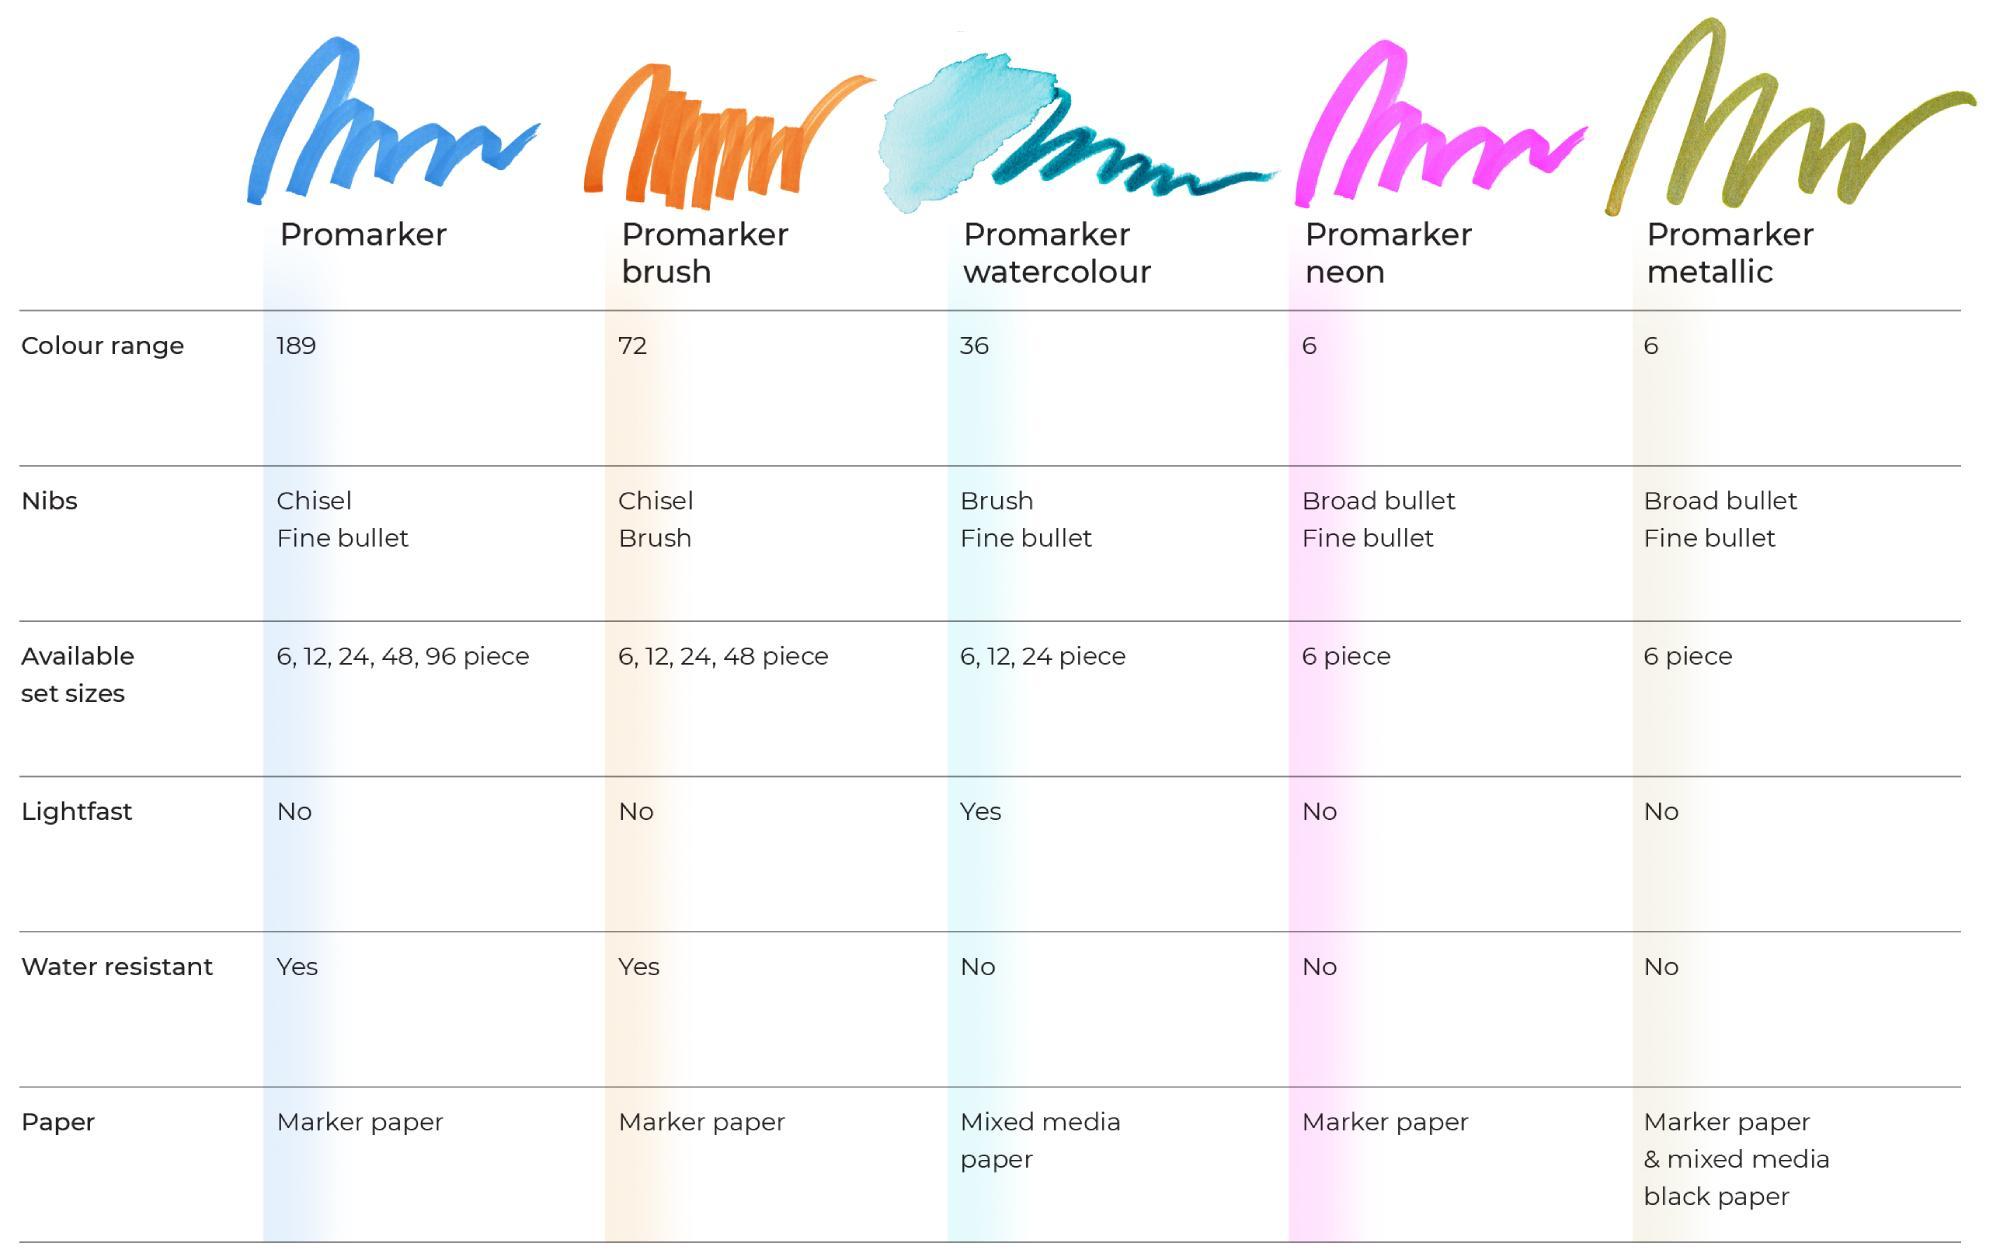 Graphic Art Promarker table